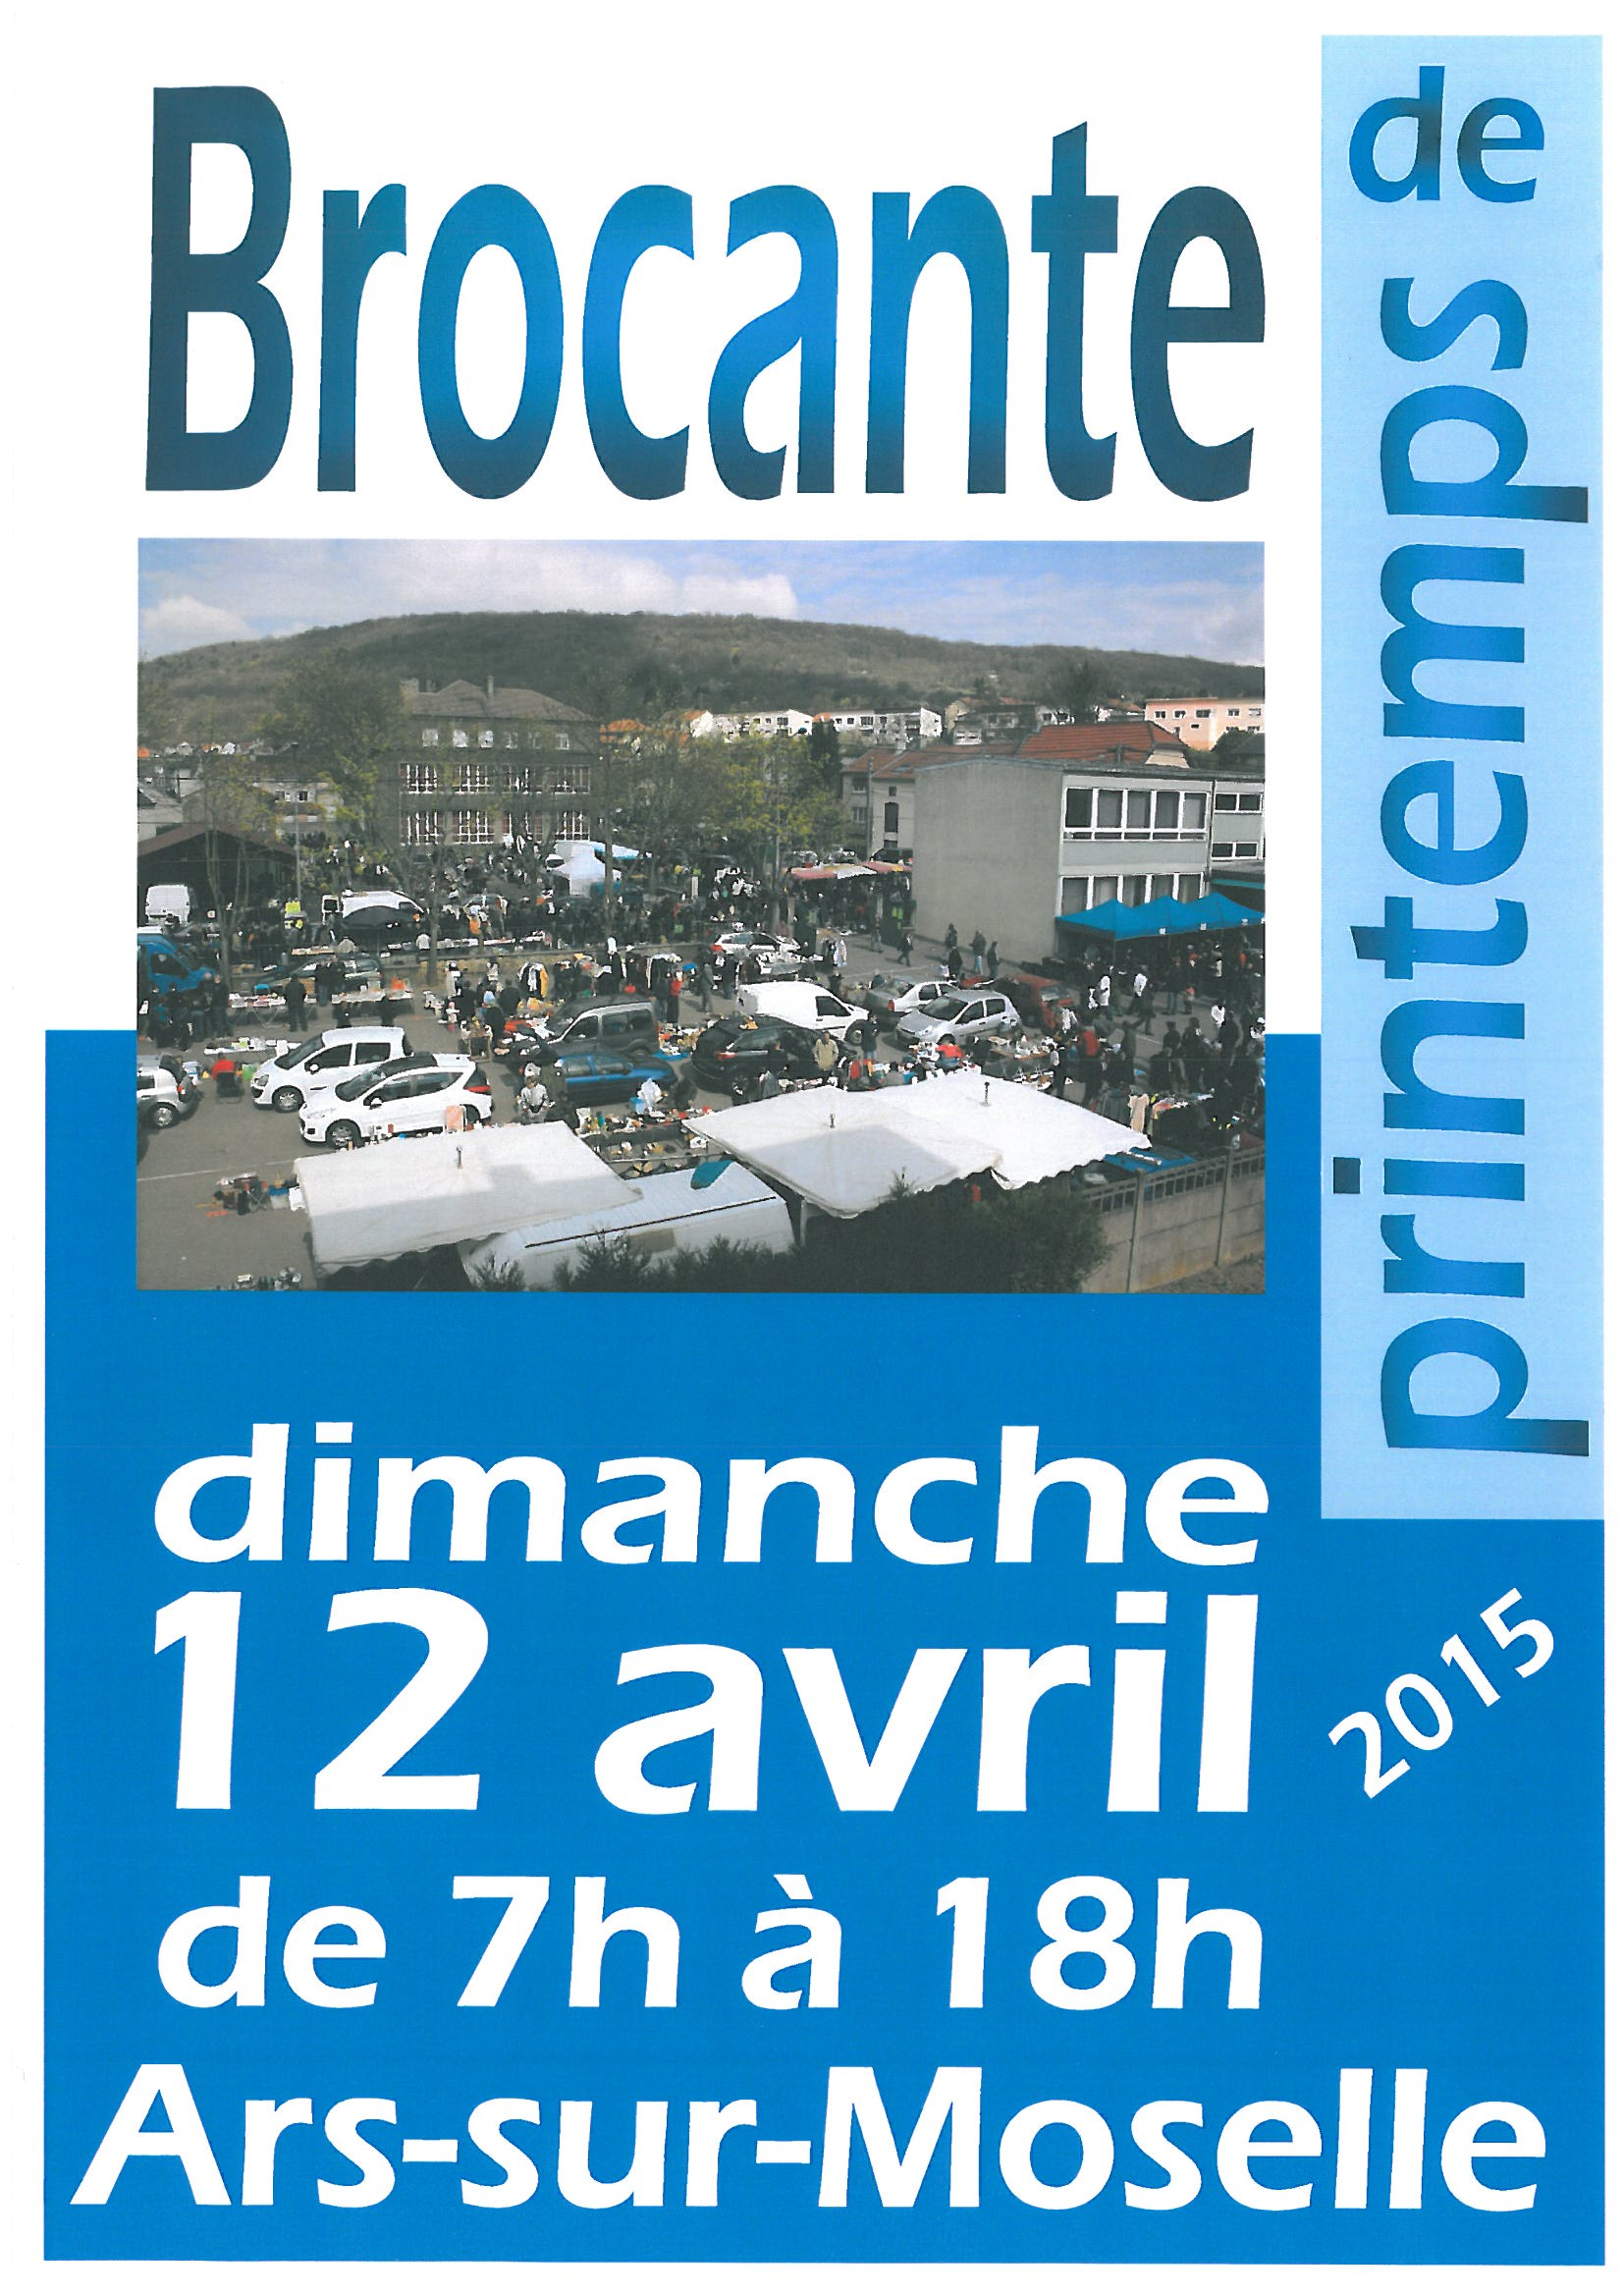 GRANDE BROCANTE DE PRINTEMPS dimanche 12 avril